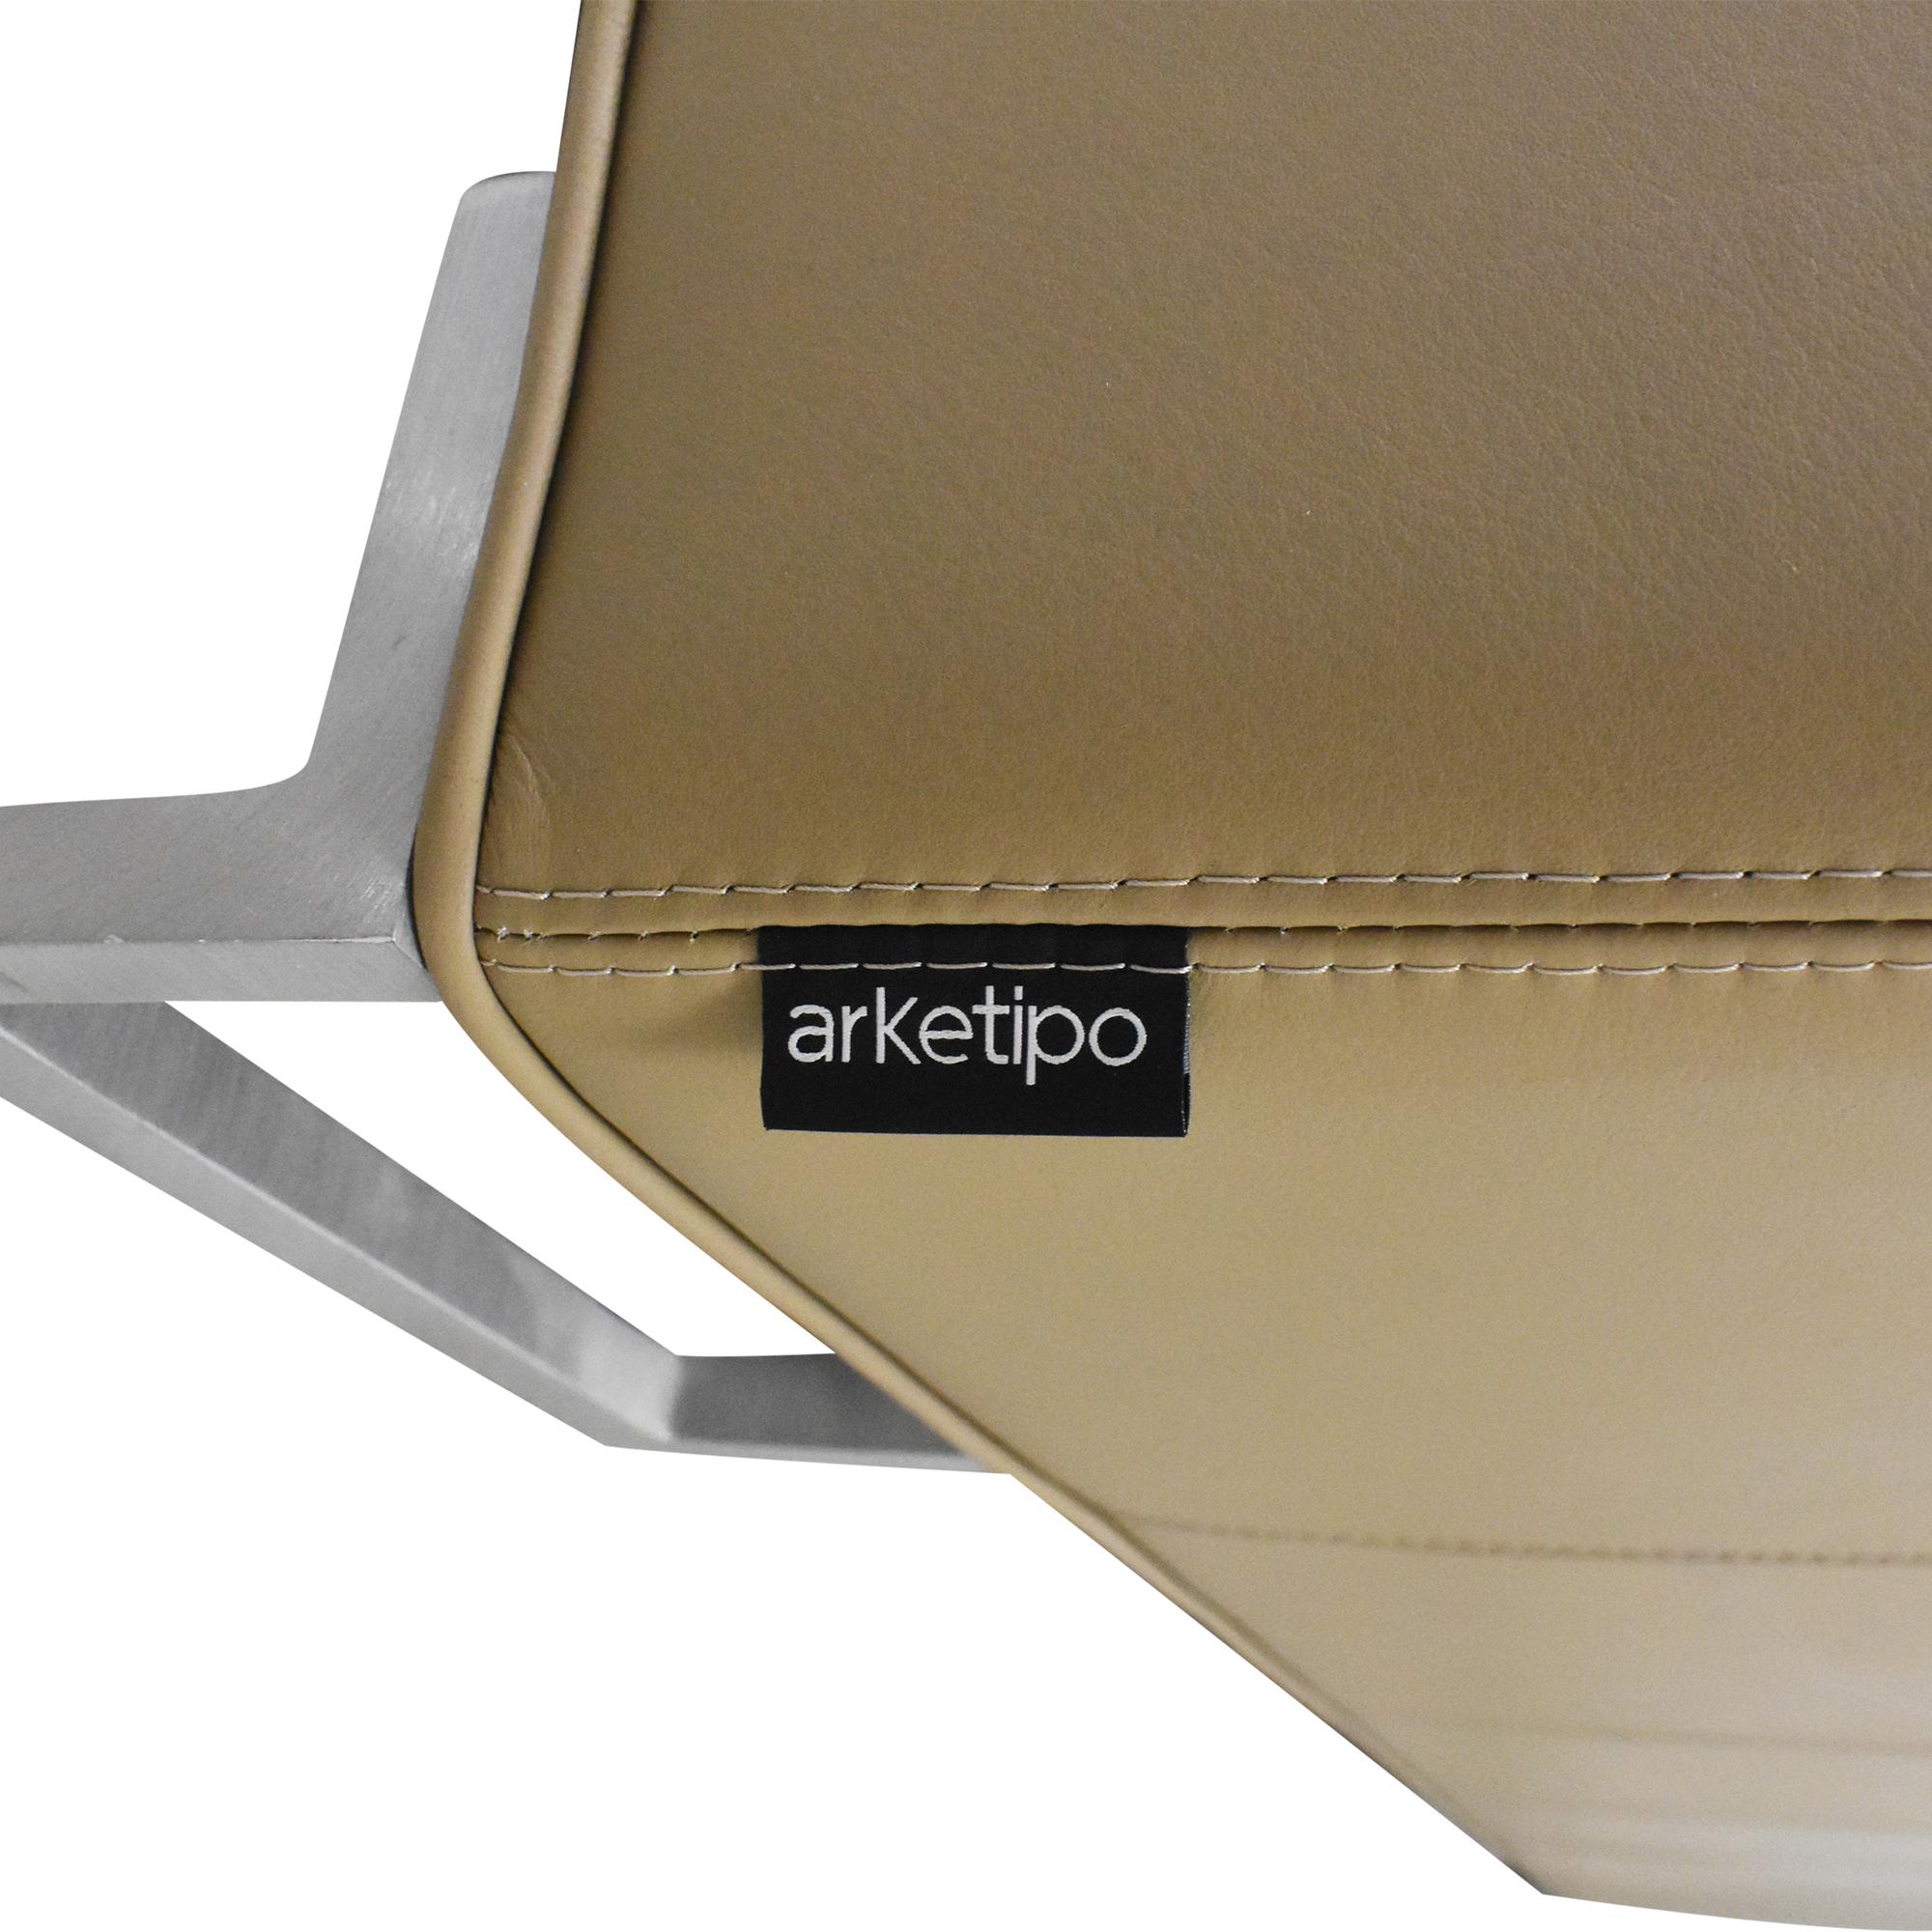 Arketipo Arketipo XL Sofa Sectionals